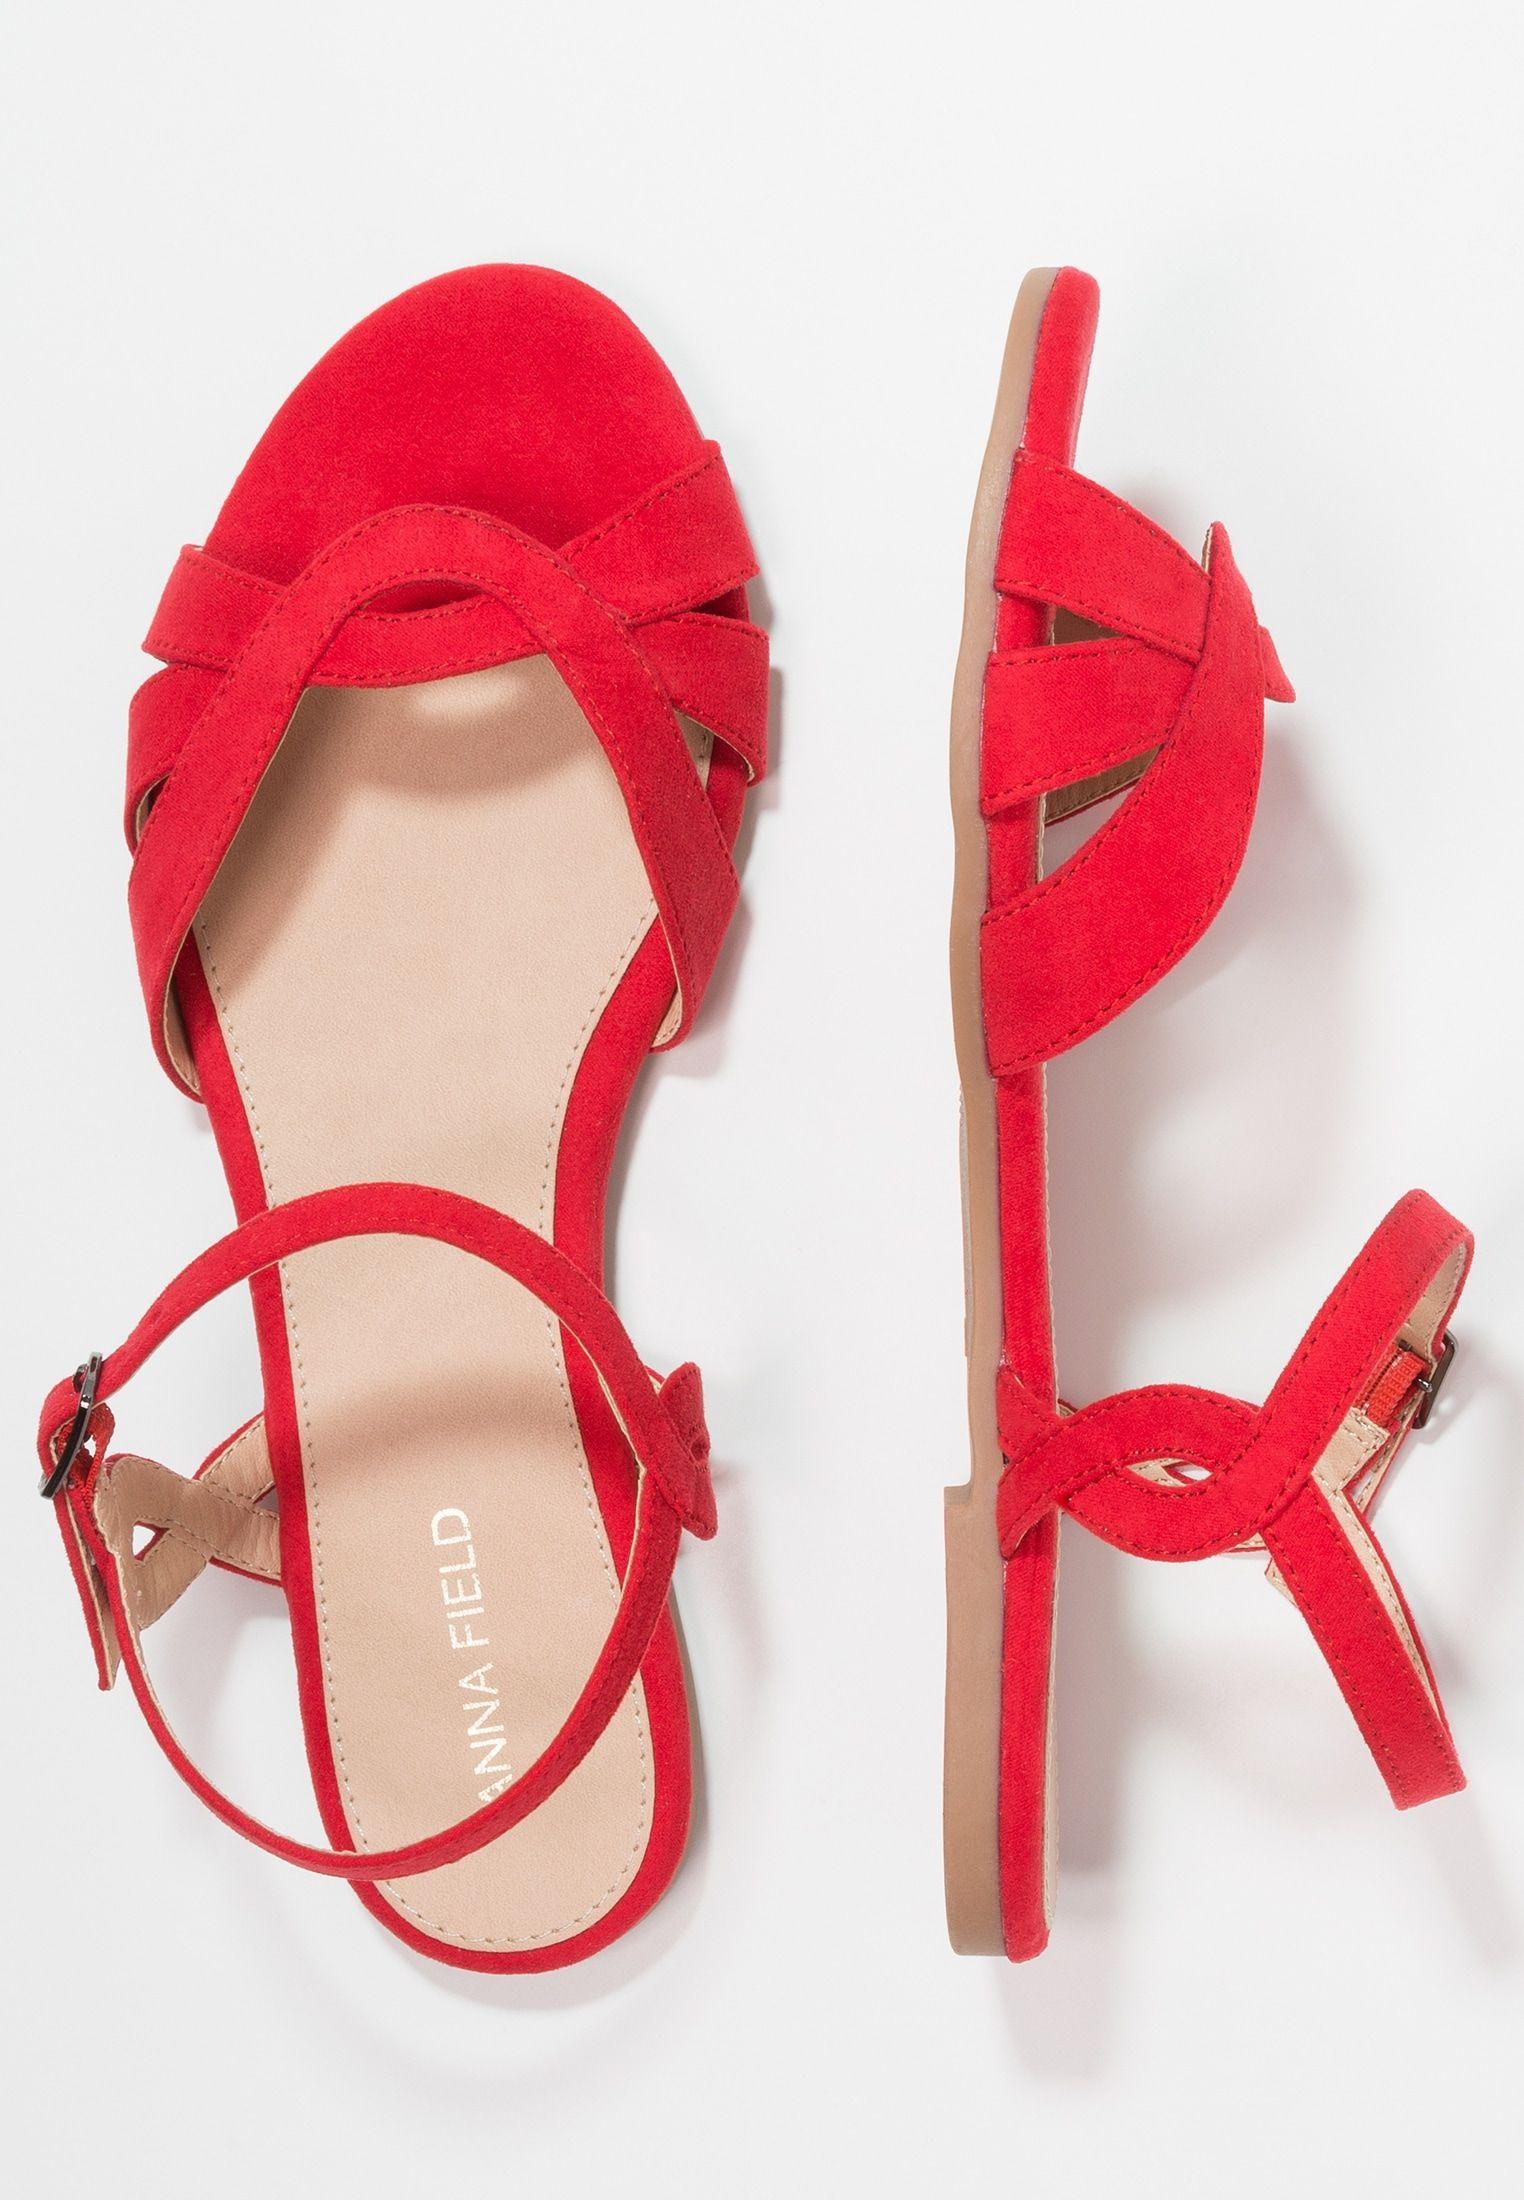 RedShoes Fields And Anna Pinterest Sandali NO8mwv0n